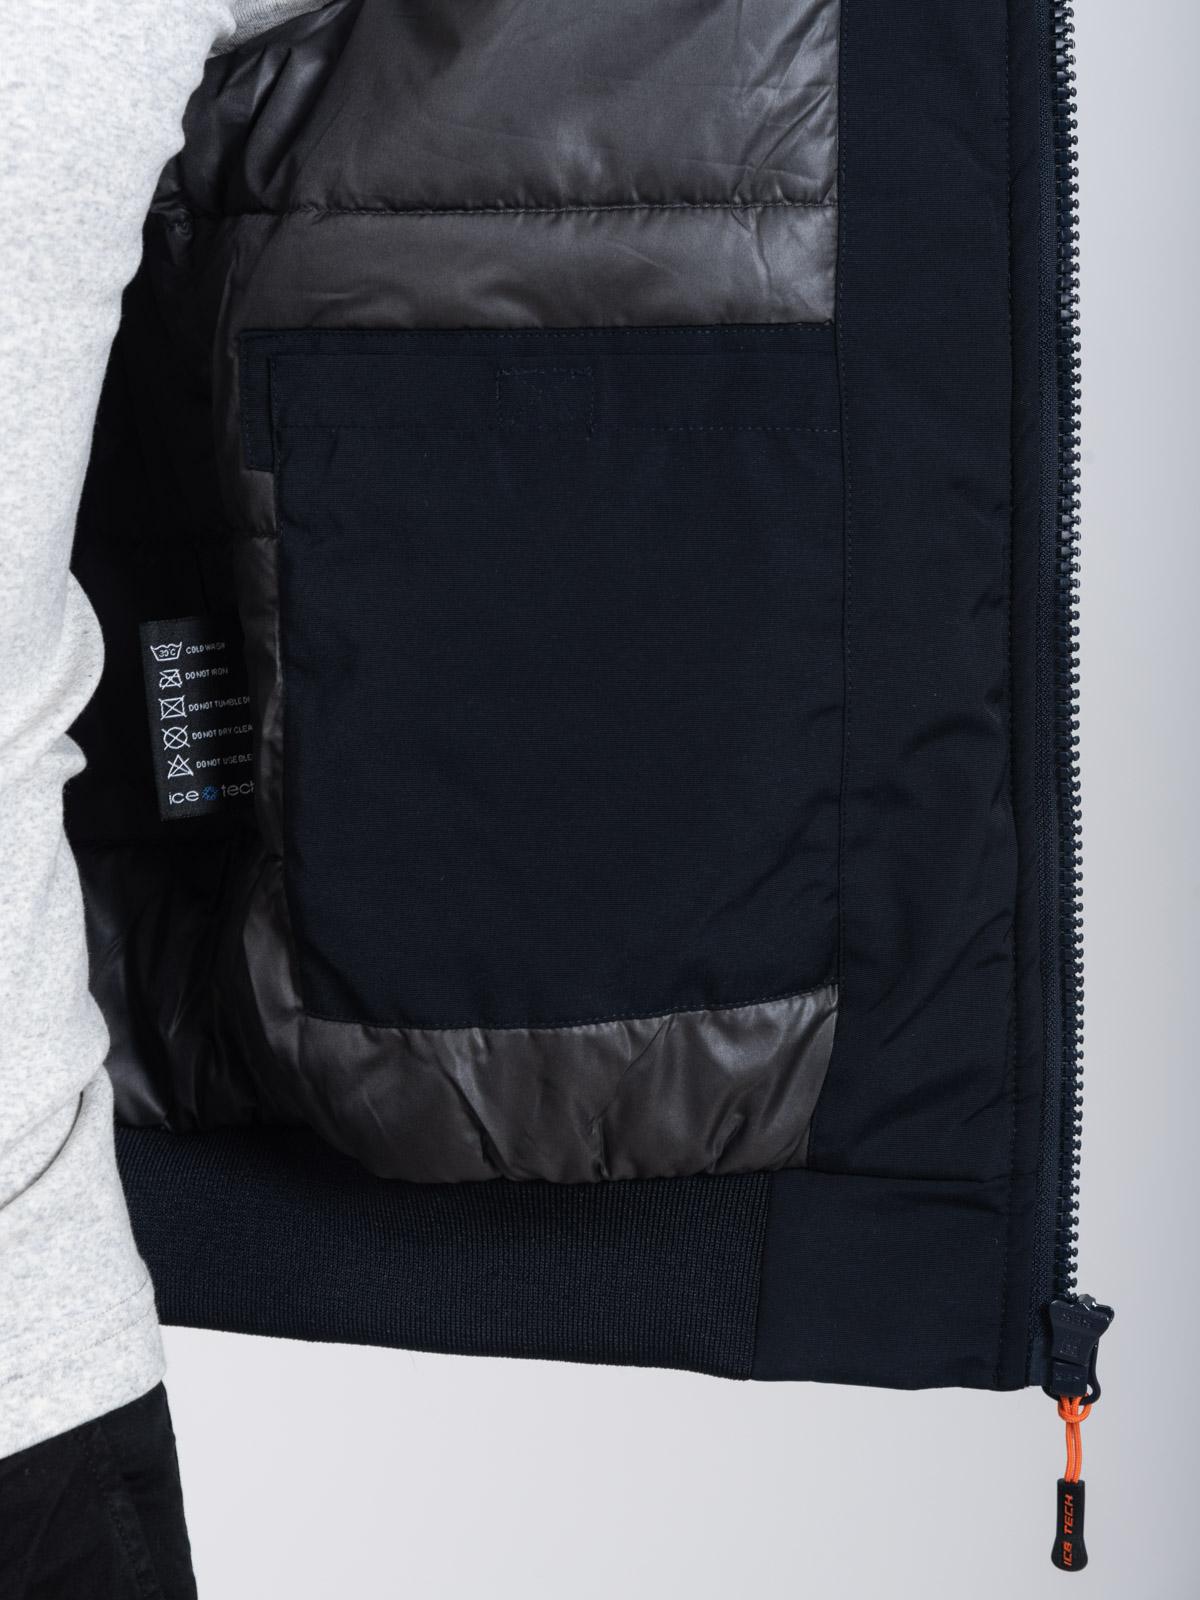 ICE TECH G821 BLUE - BLACK - ΑΝΡΙΚΟ ΤΖΑΚΕΤ ΜΑΥΡΟ ΜΠΛΕ